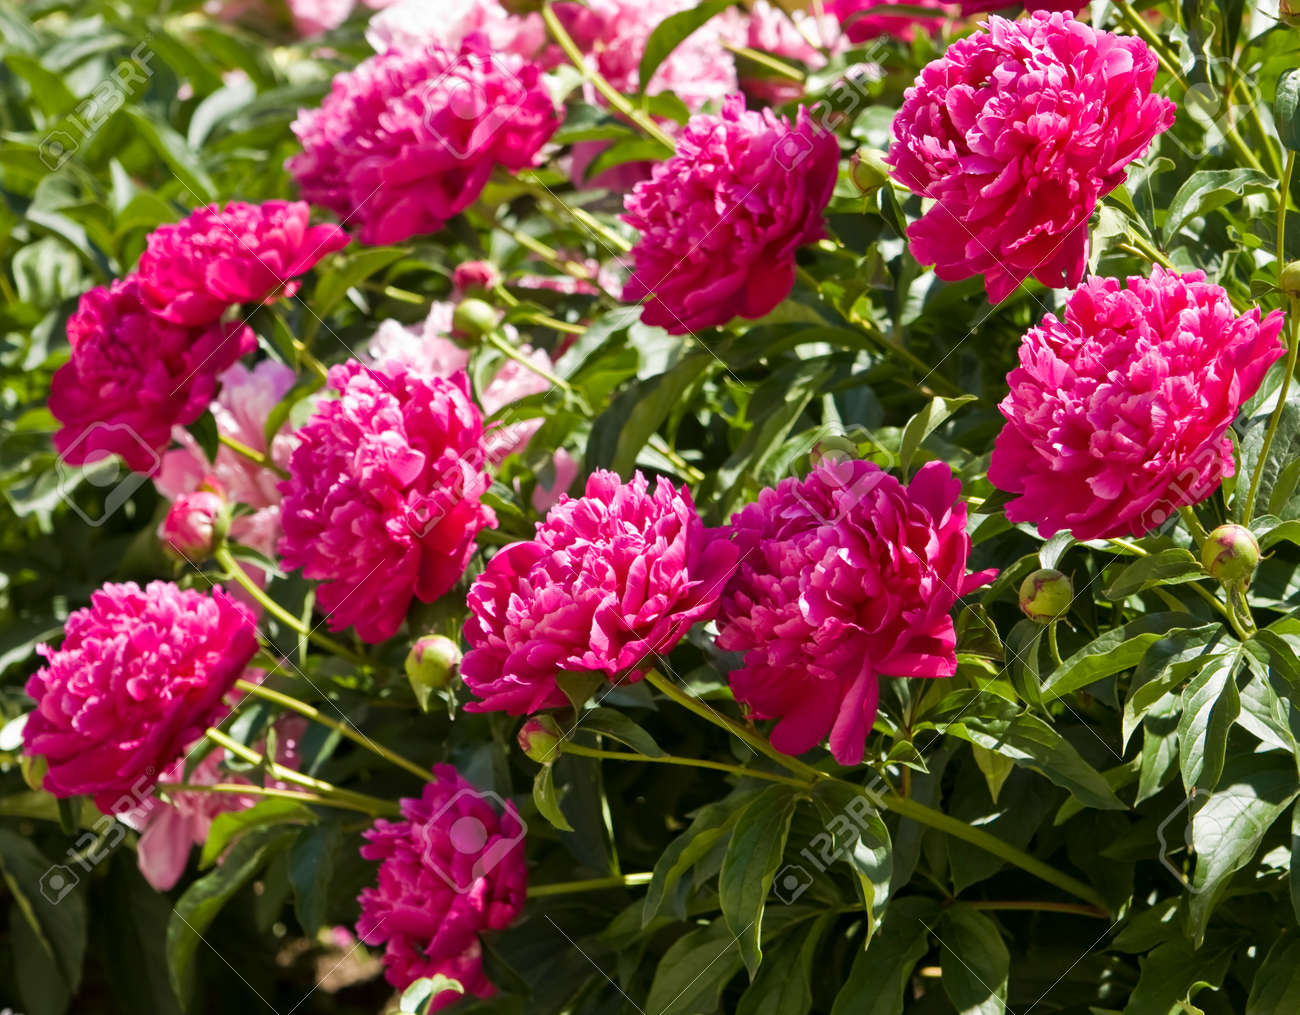 Shrub With Many Peony Flowers Of Crimson Rasberry Pink Colour